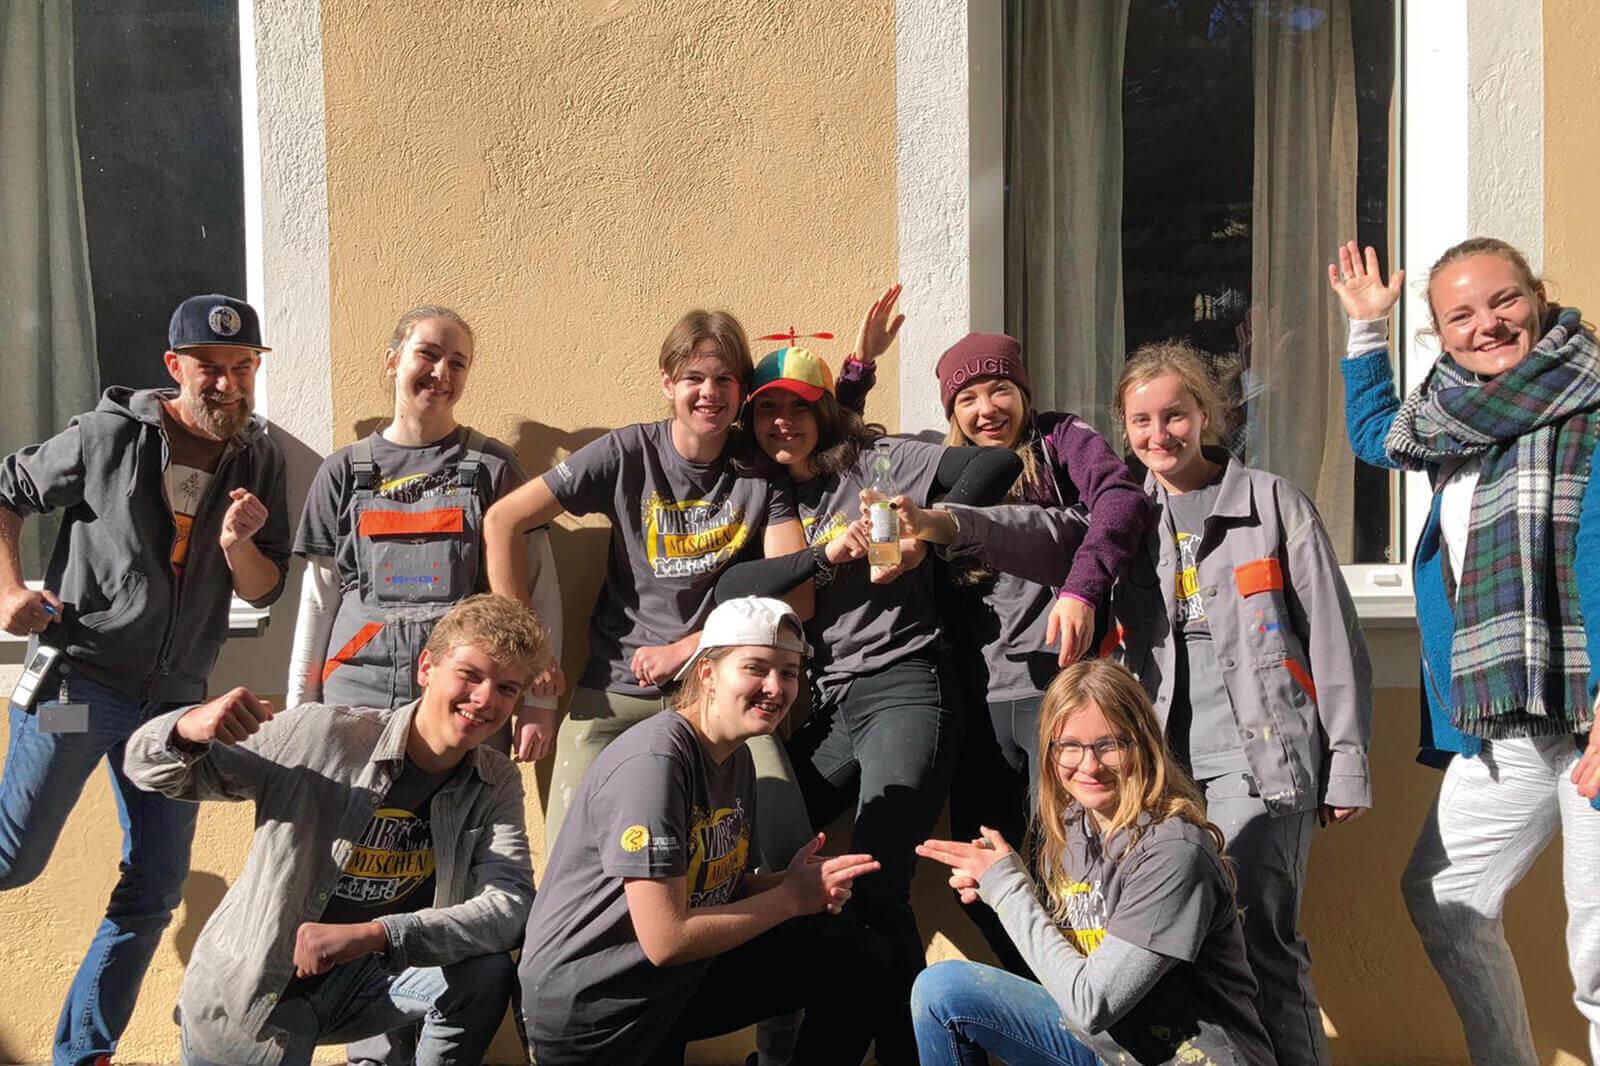 72 Stunden ohne Kompromiss - Eggerheim Kärnten